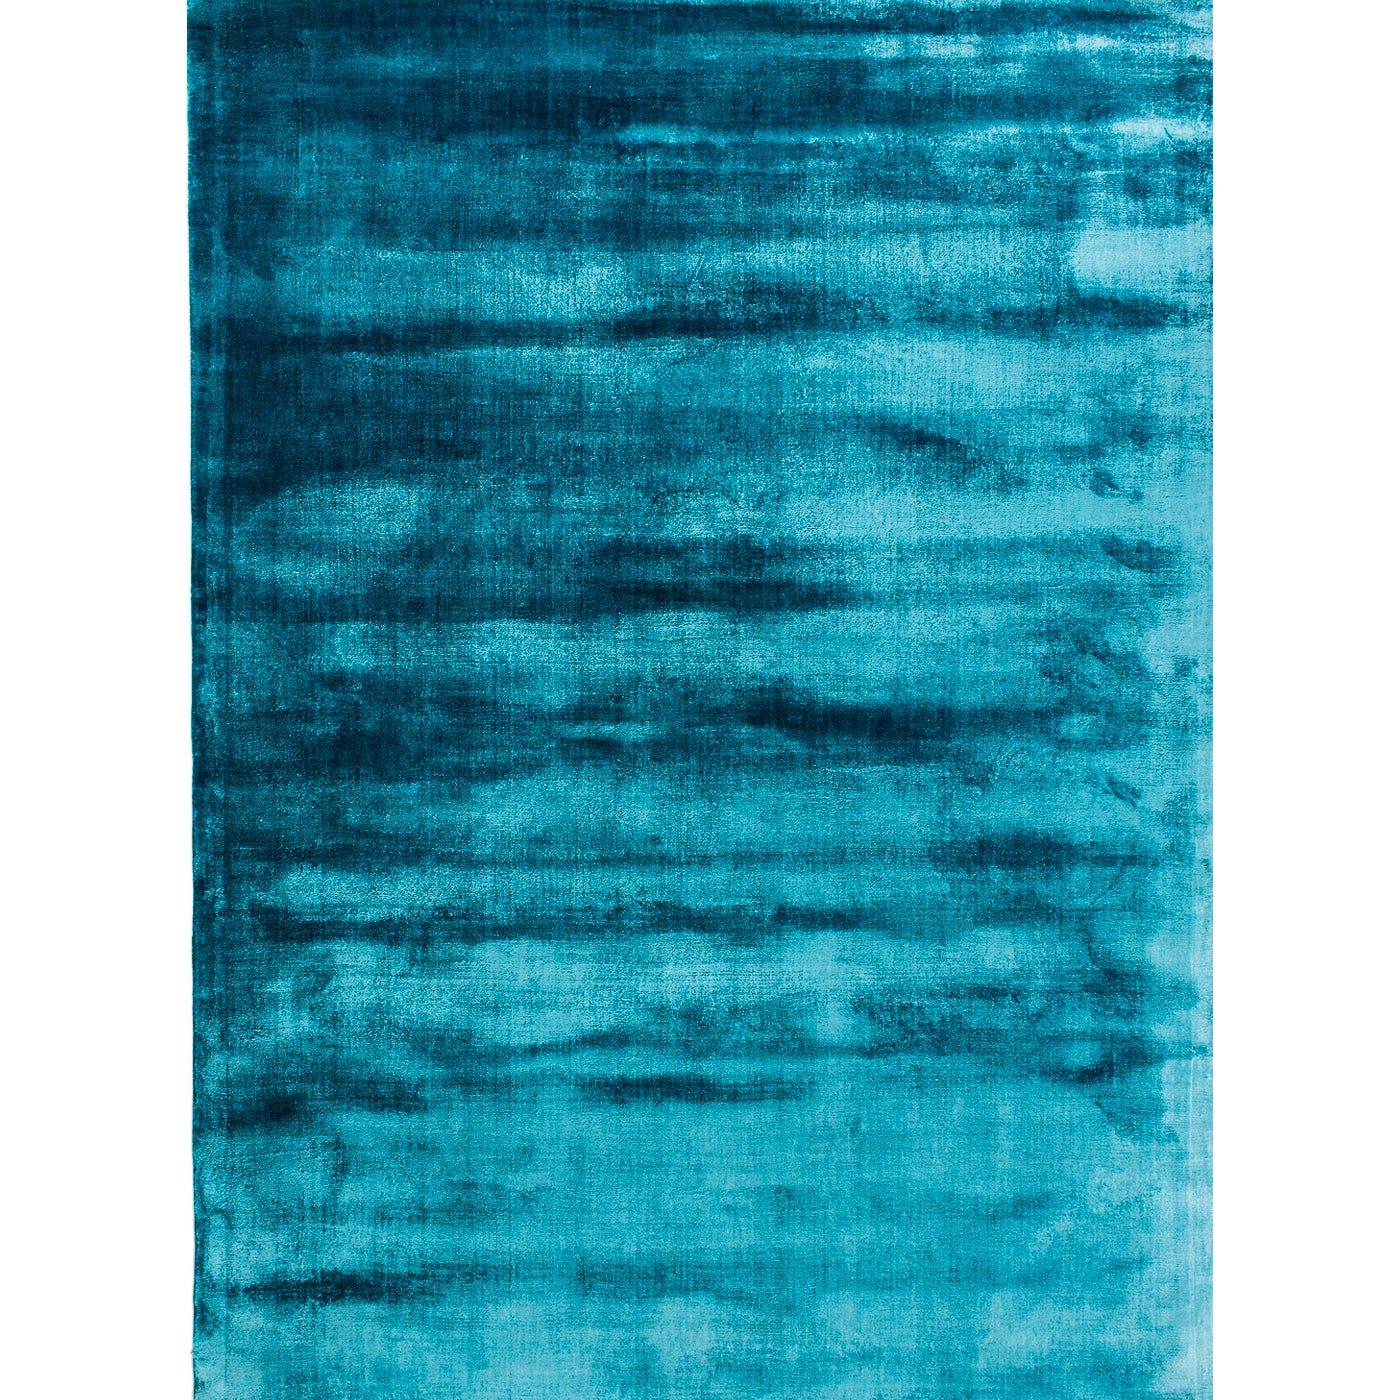 Lucens Rug Dark Blue 140 x 200cm Discontinued